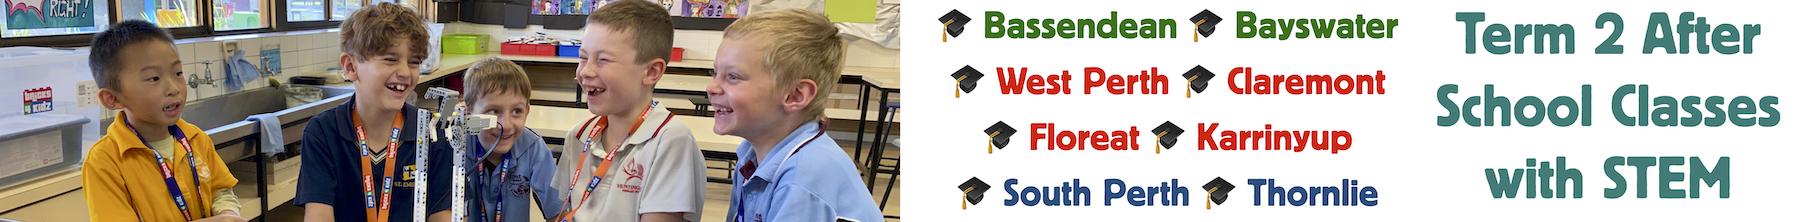 Term 4 After School Banner